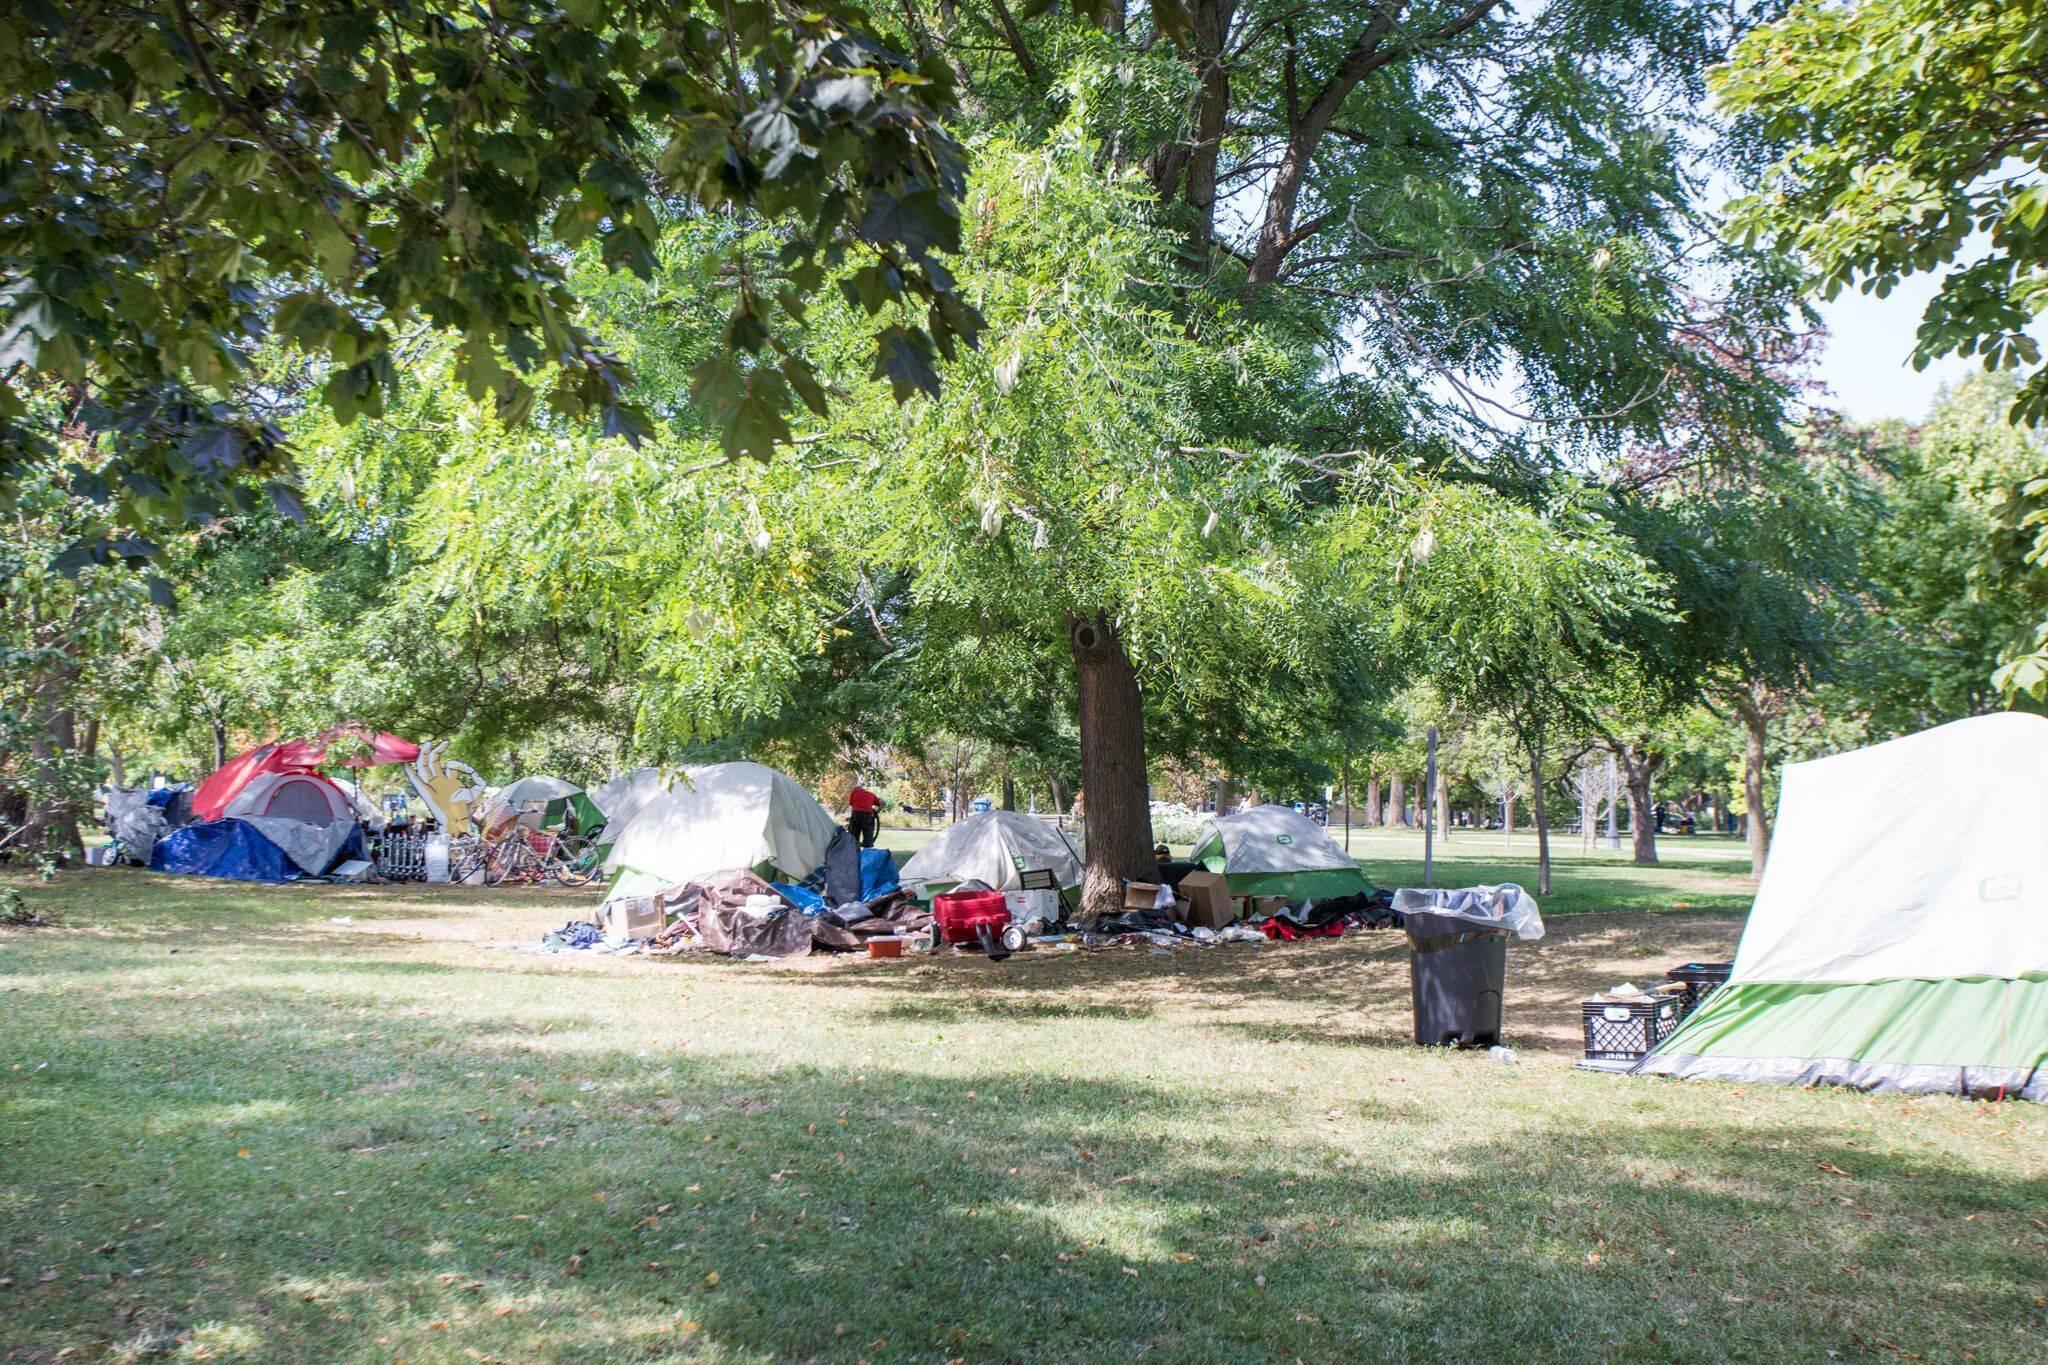 encampment support network